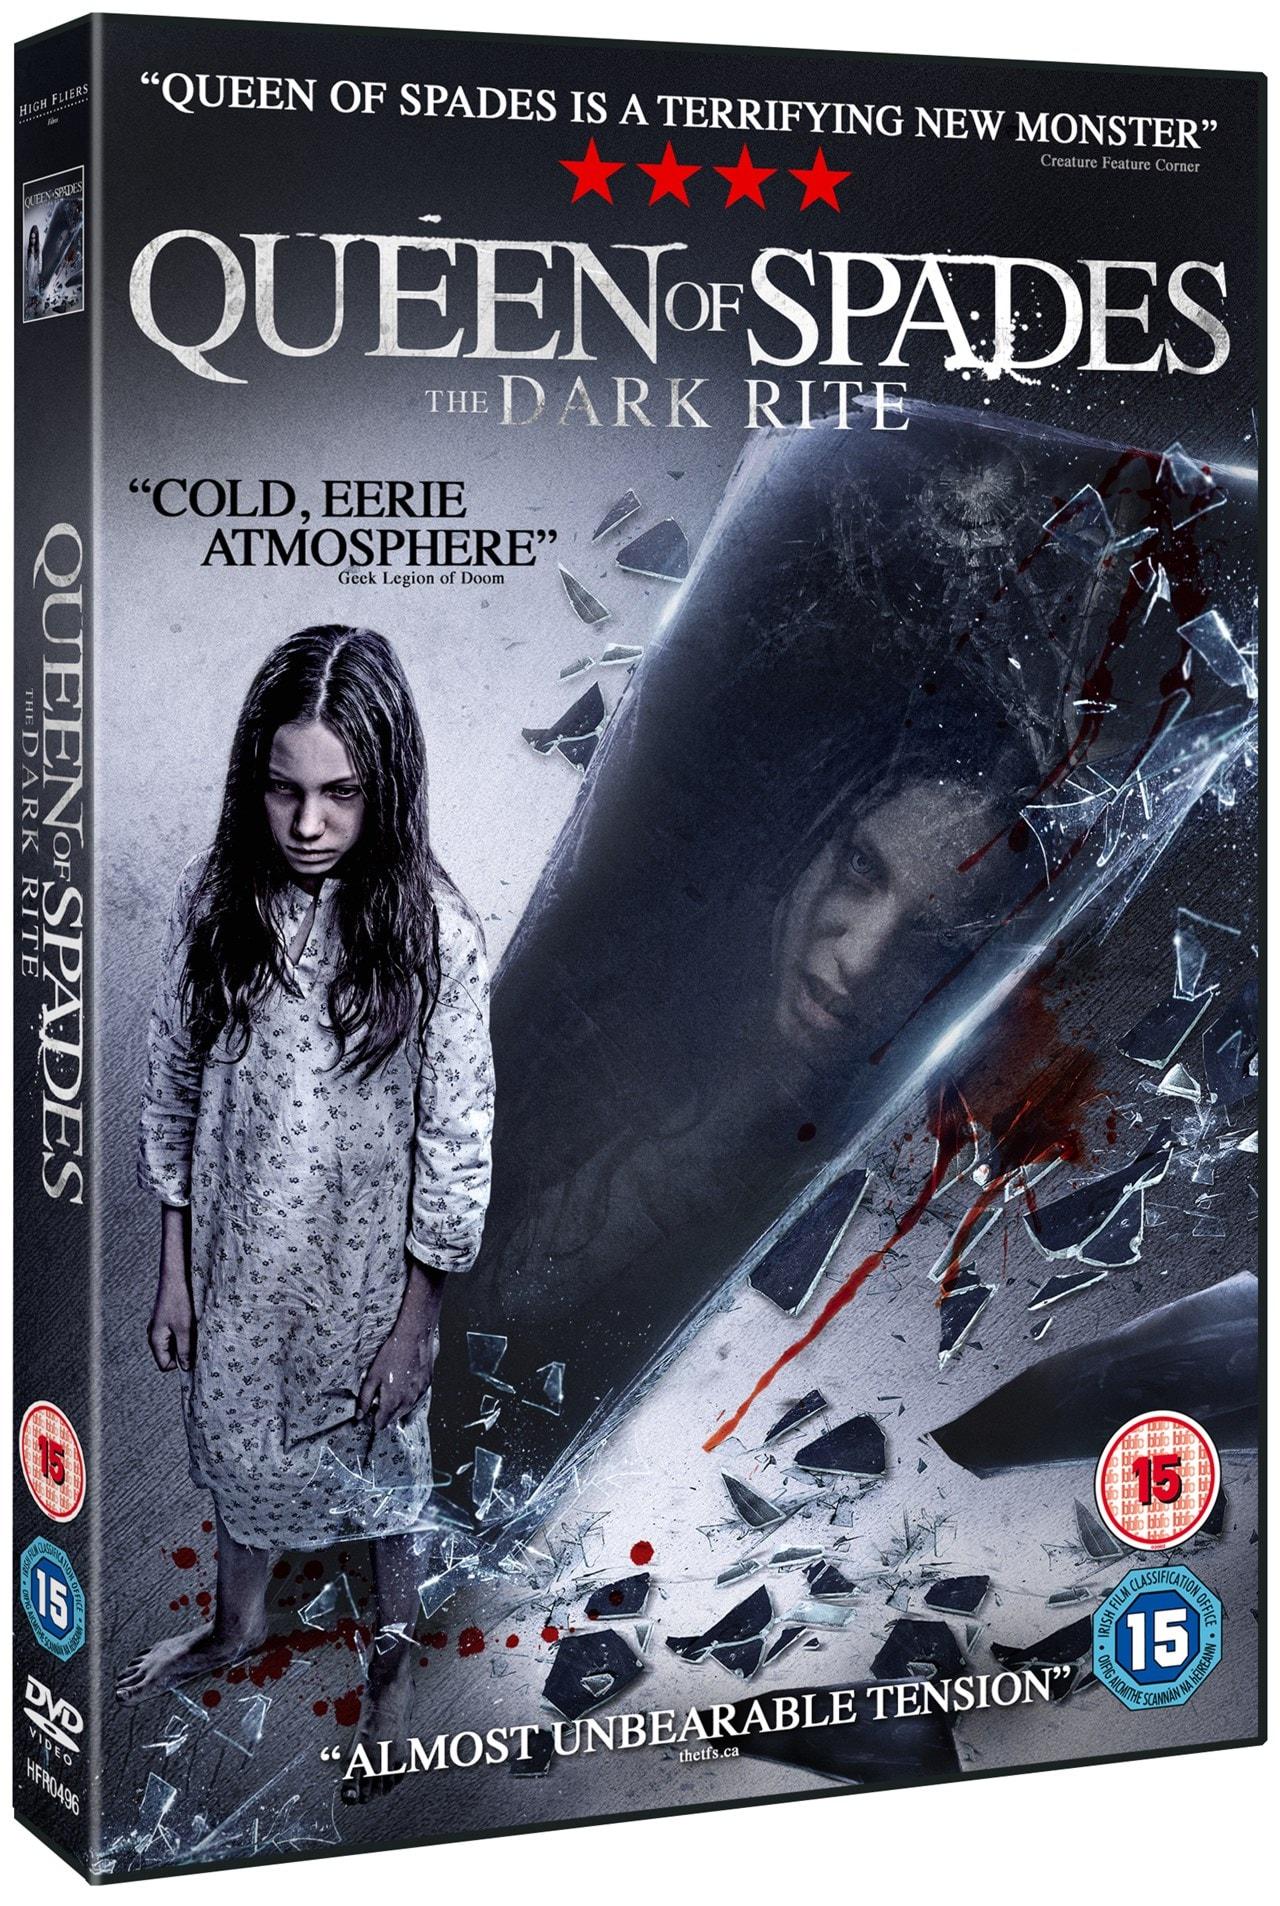 Queen of Spades - The Dark Rite - 2